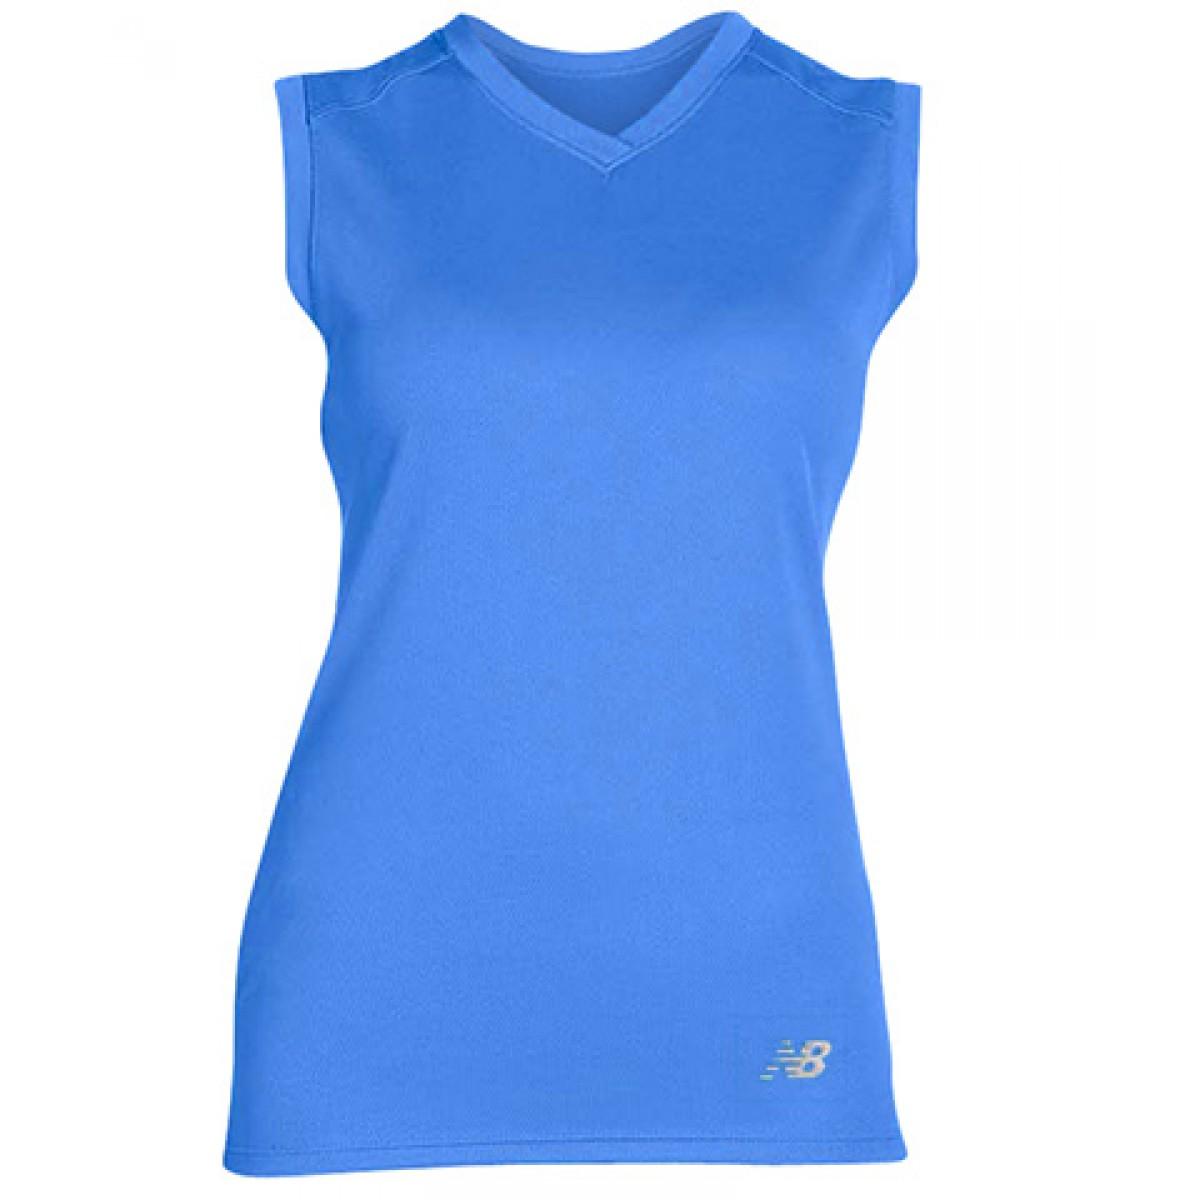 Ladies' Athletic V-Neck Performance T-Shirt-Blue-XL